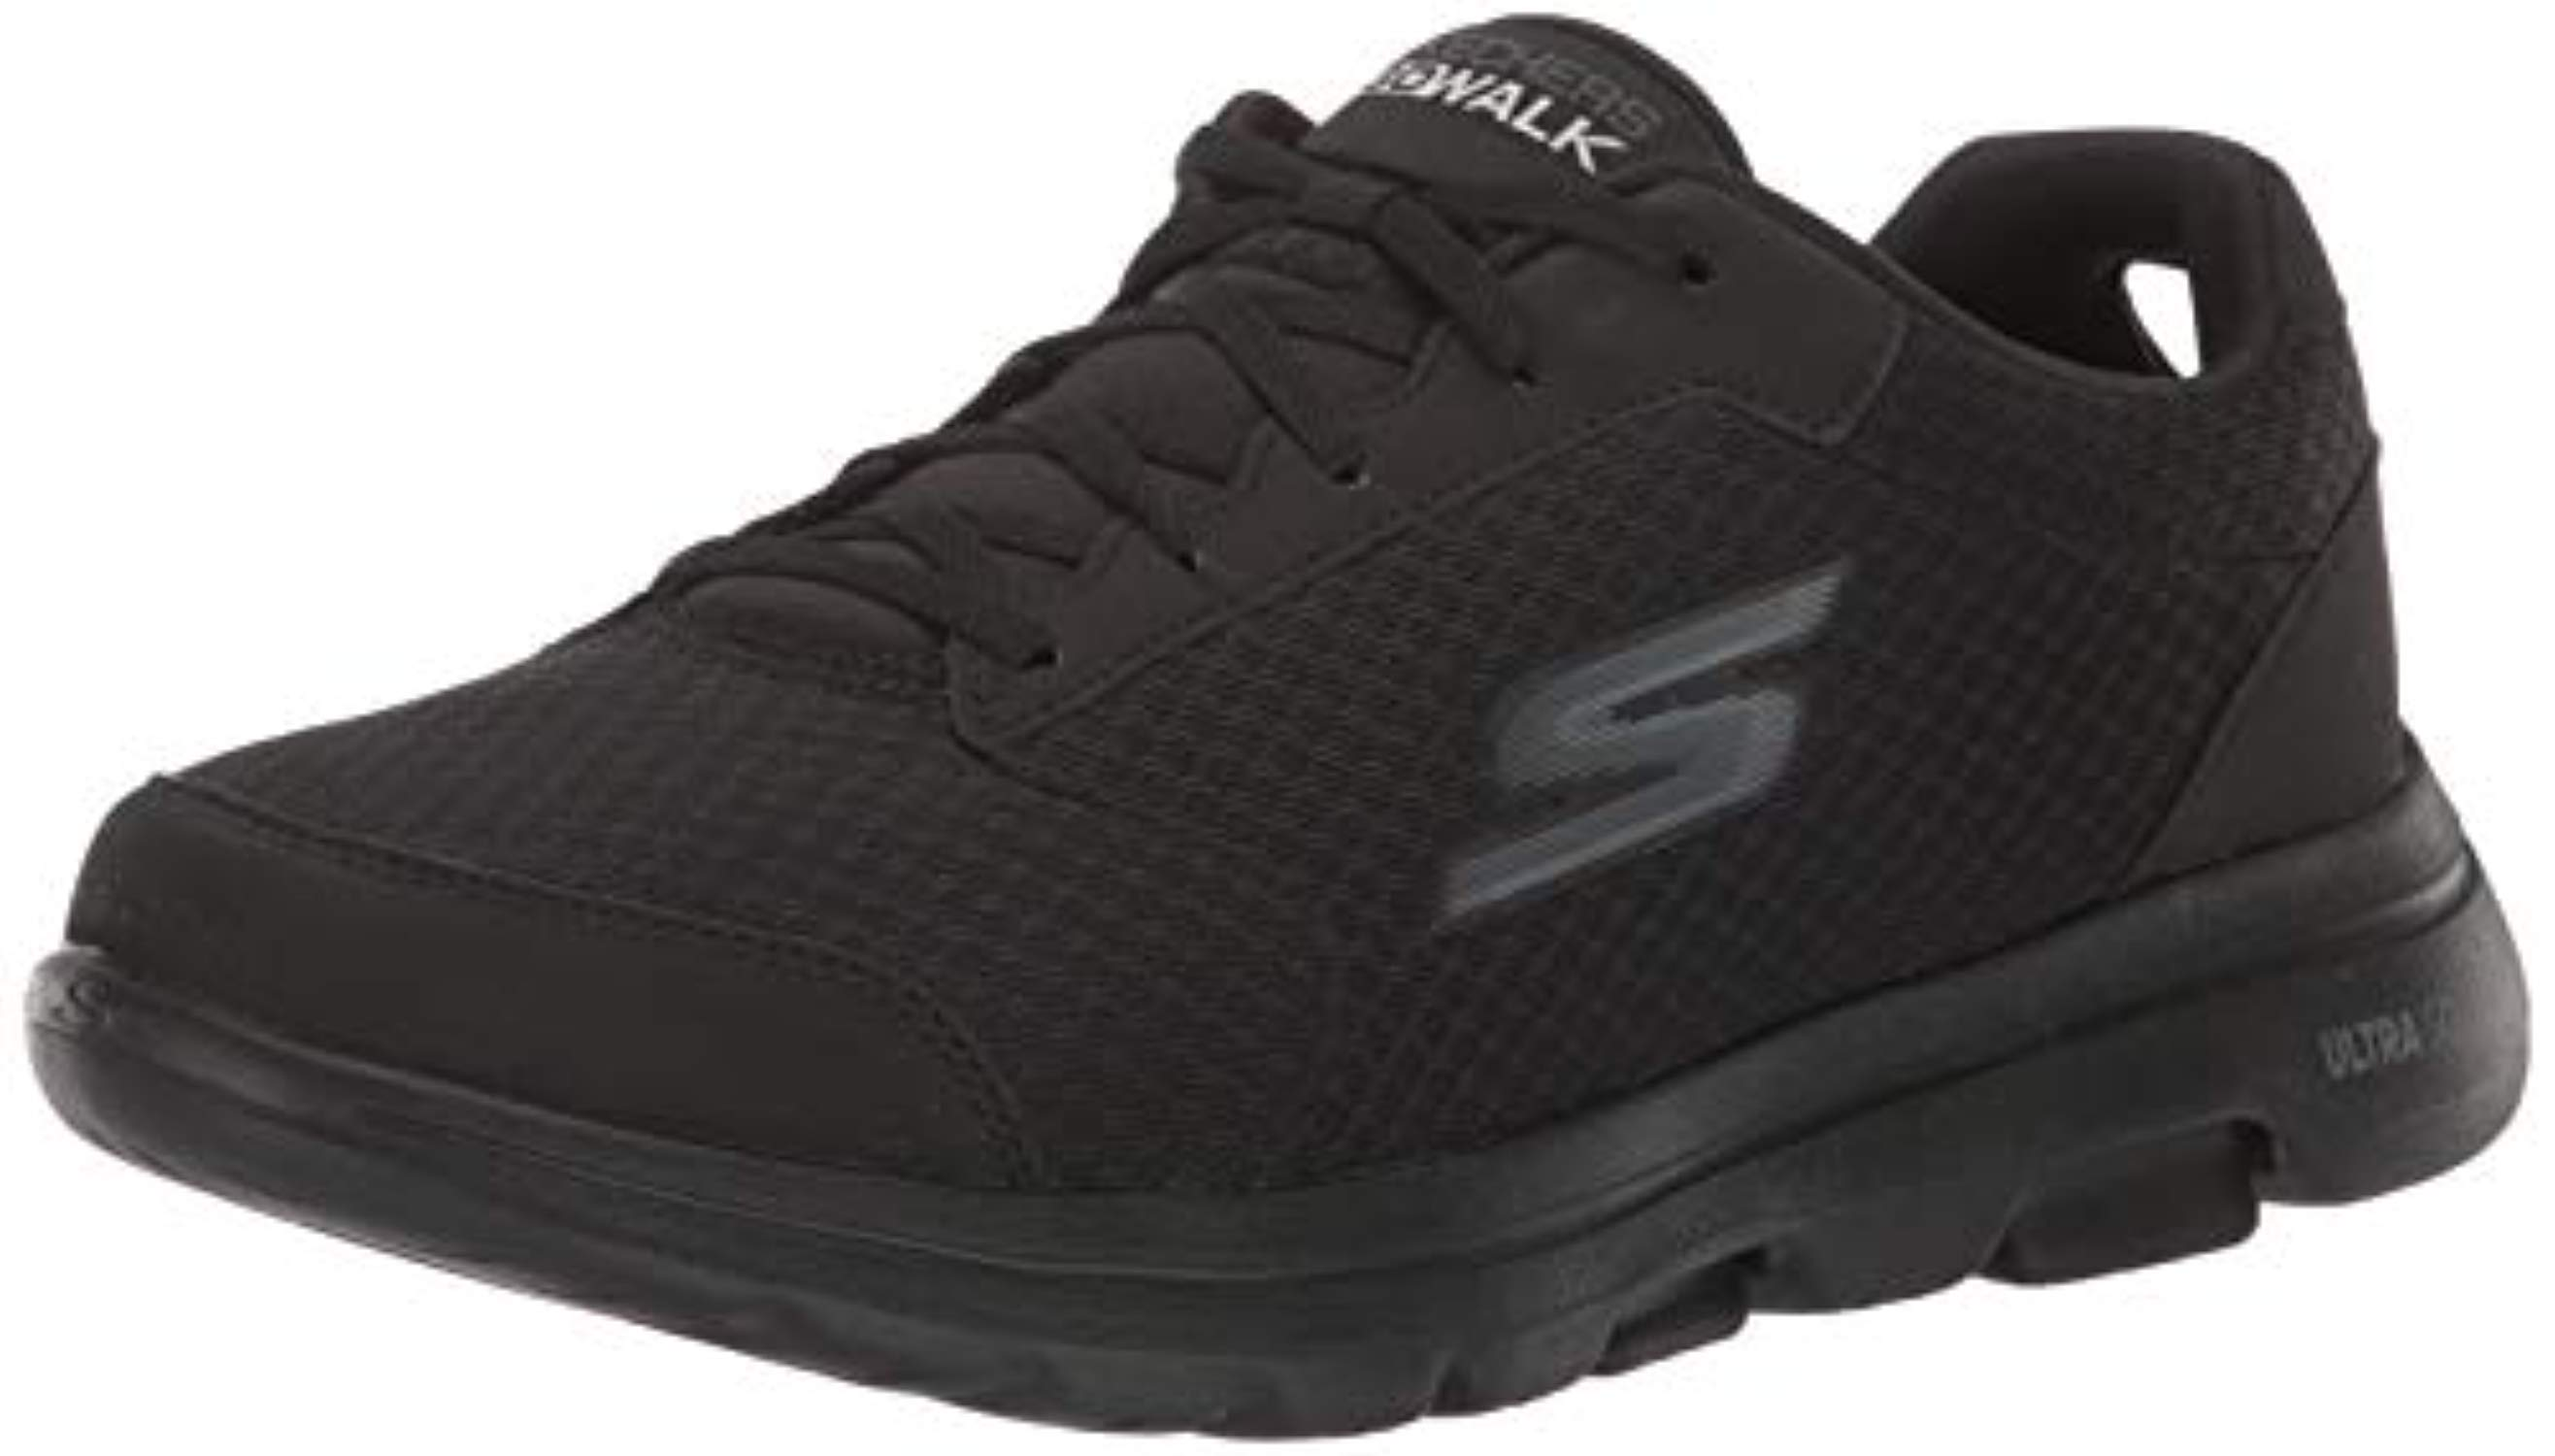 Skechers Skechers Men's GO Walk 5 Qualify Shoe, Black, 10.5 Extra Wide US